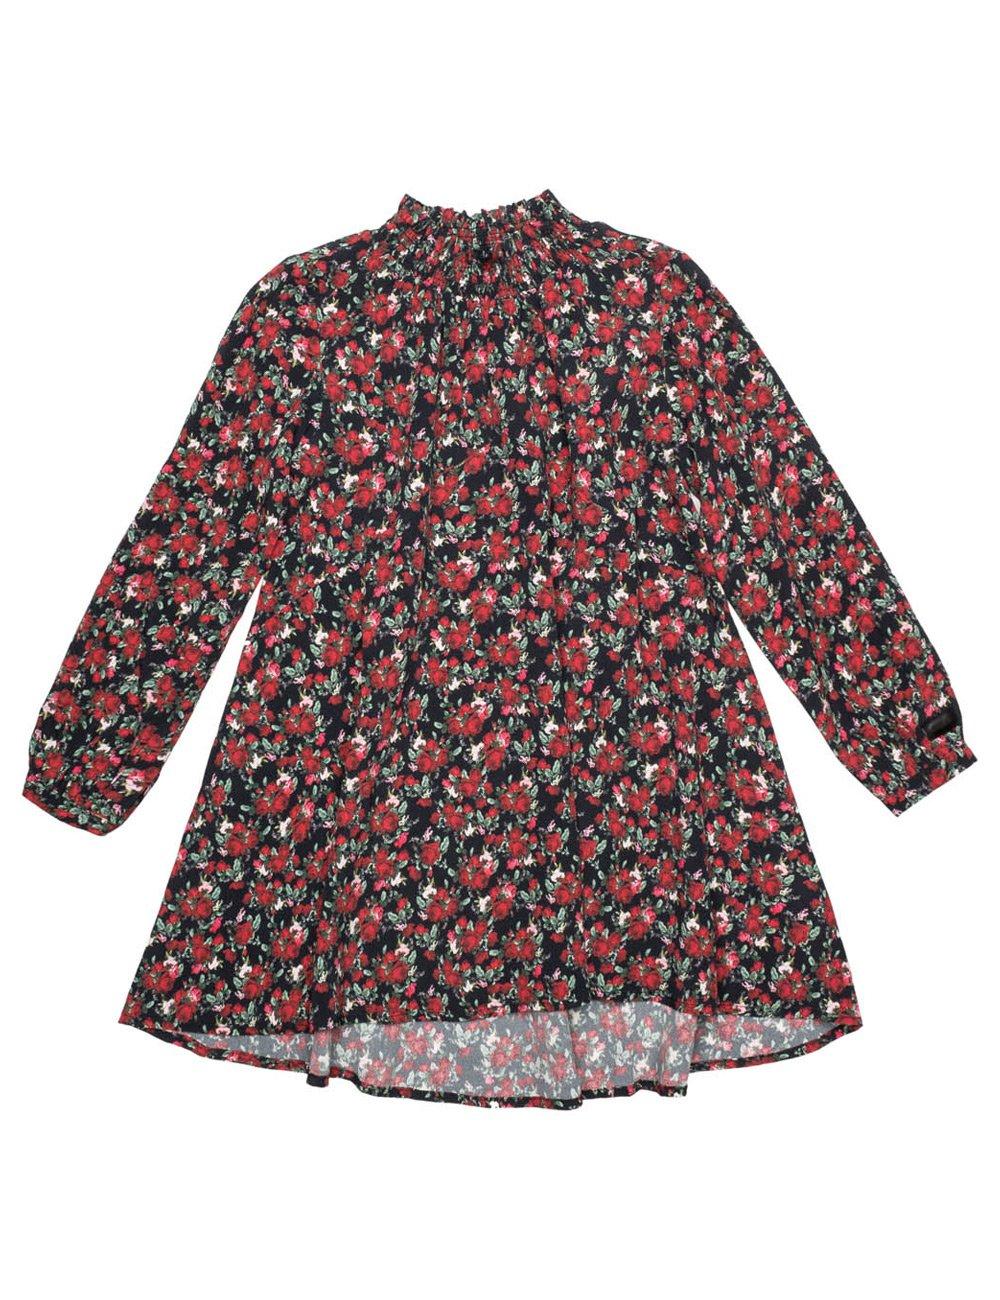 REPLAY Girls Printed Floral Crepe Dress In Black In Size 8 Years Black